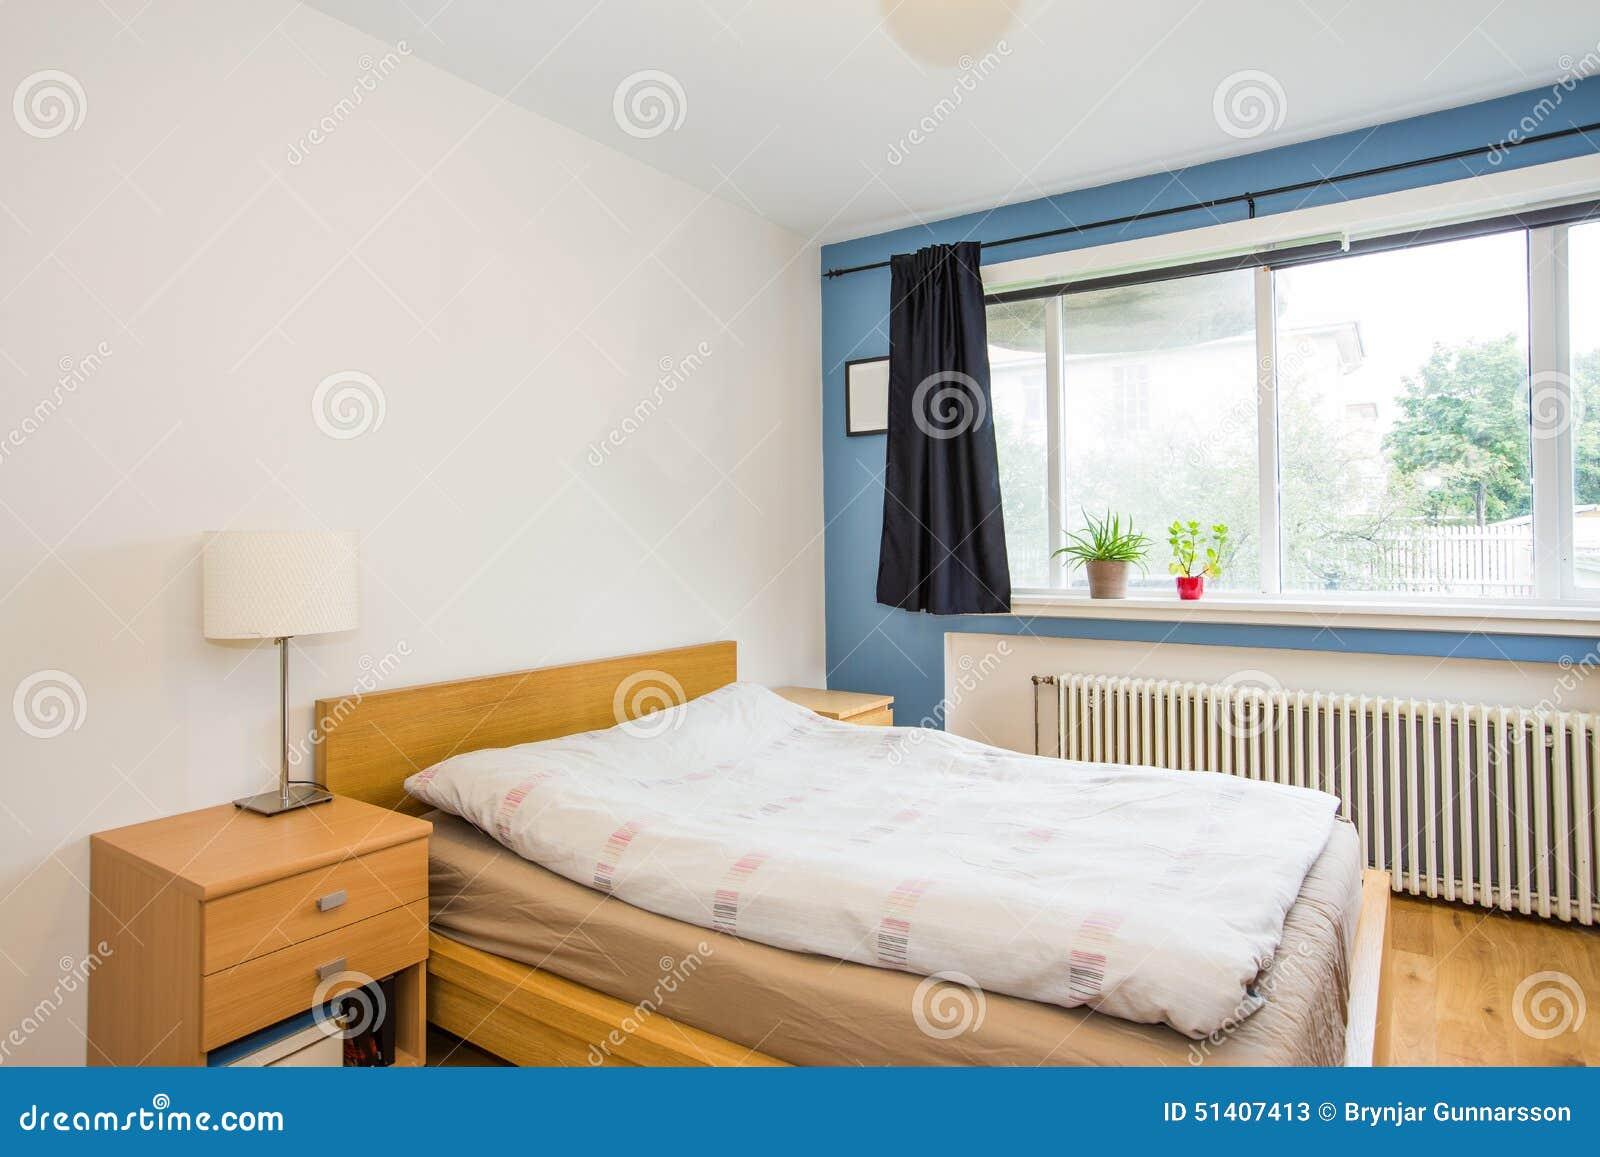 Bedroom interior stock photo image 51407413 for Interior design bedroom blue